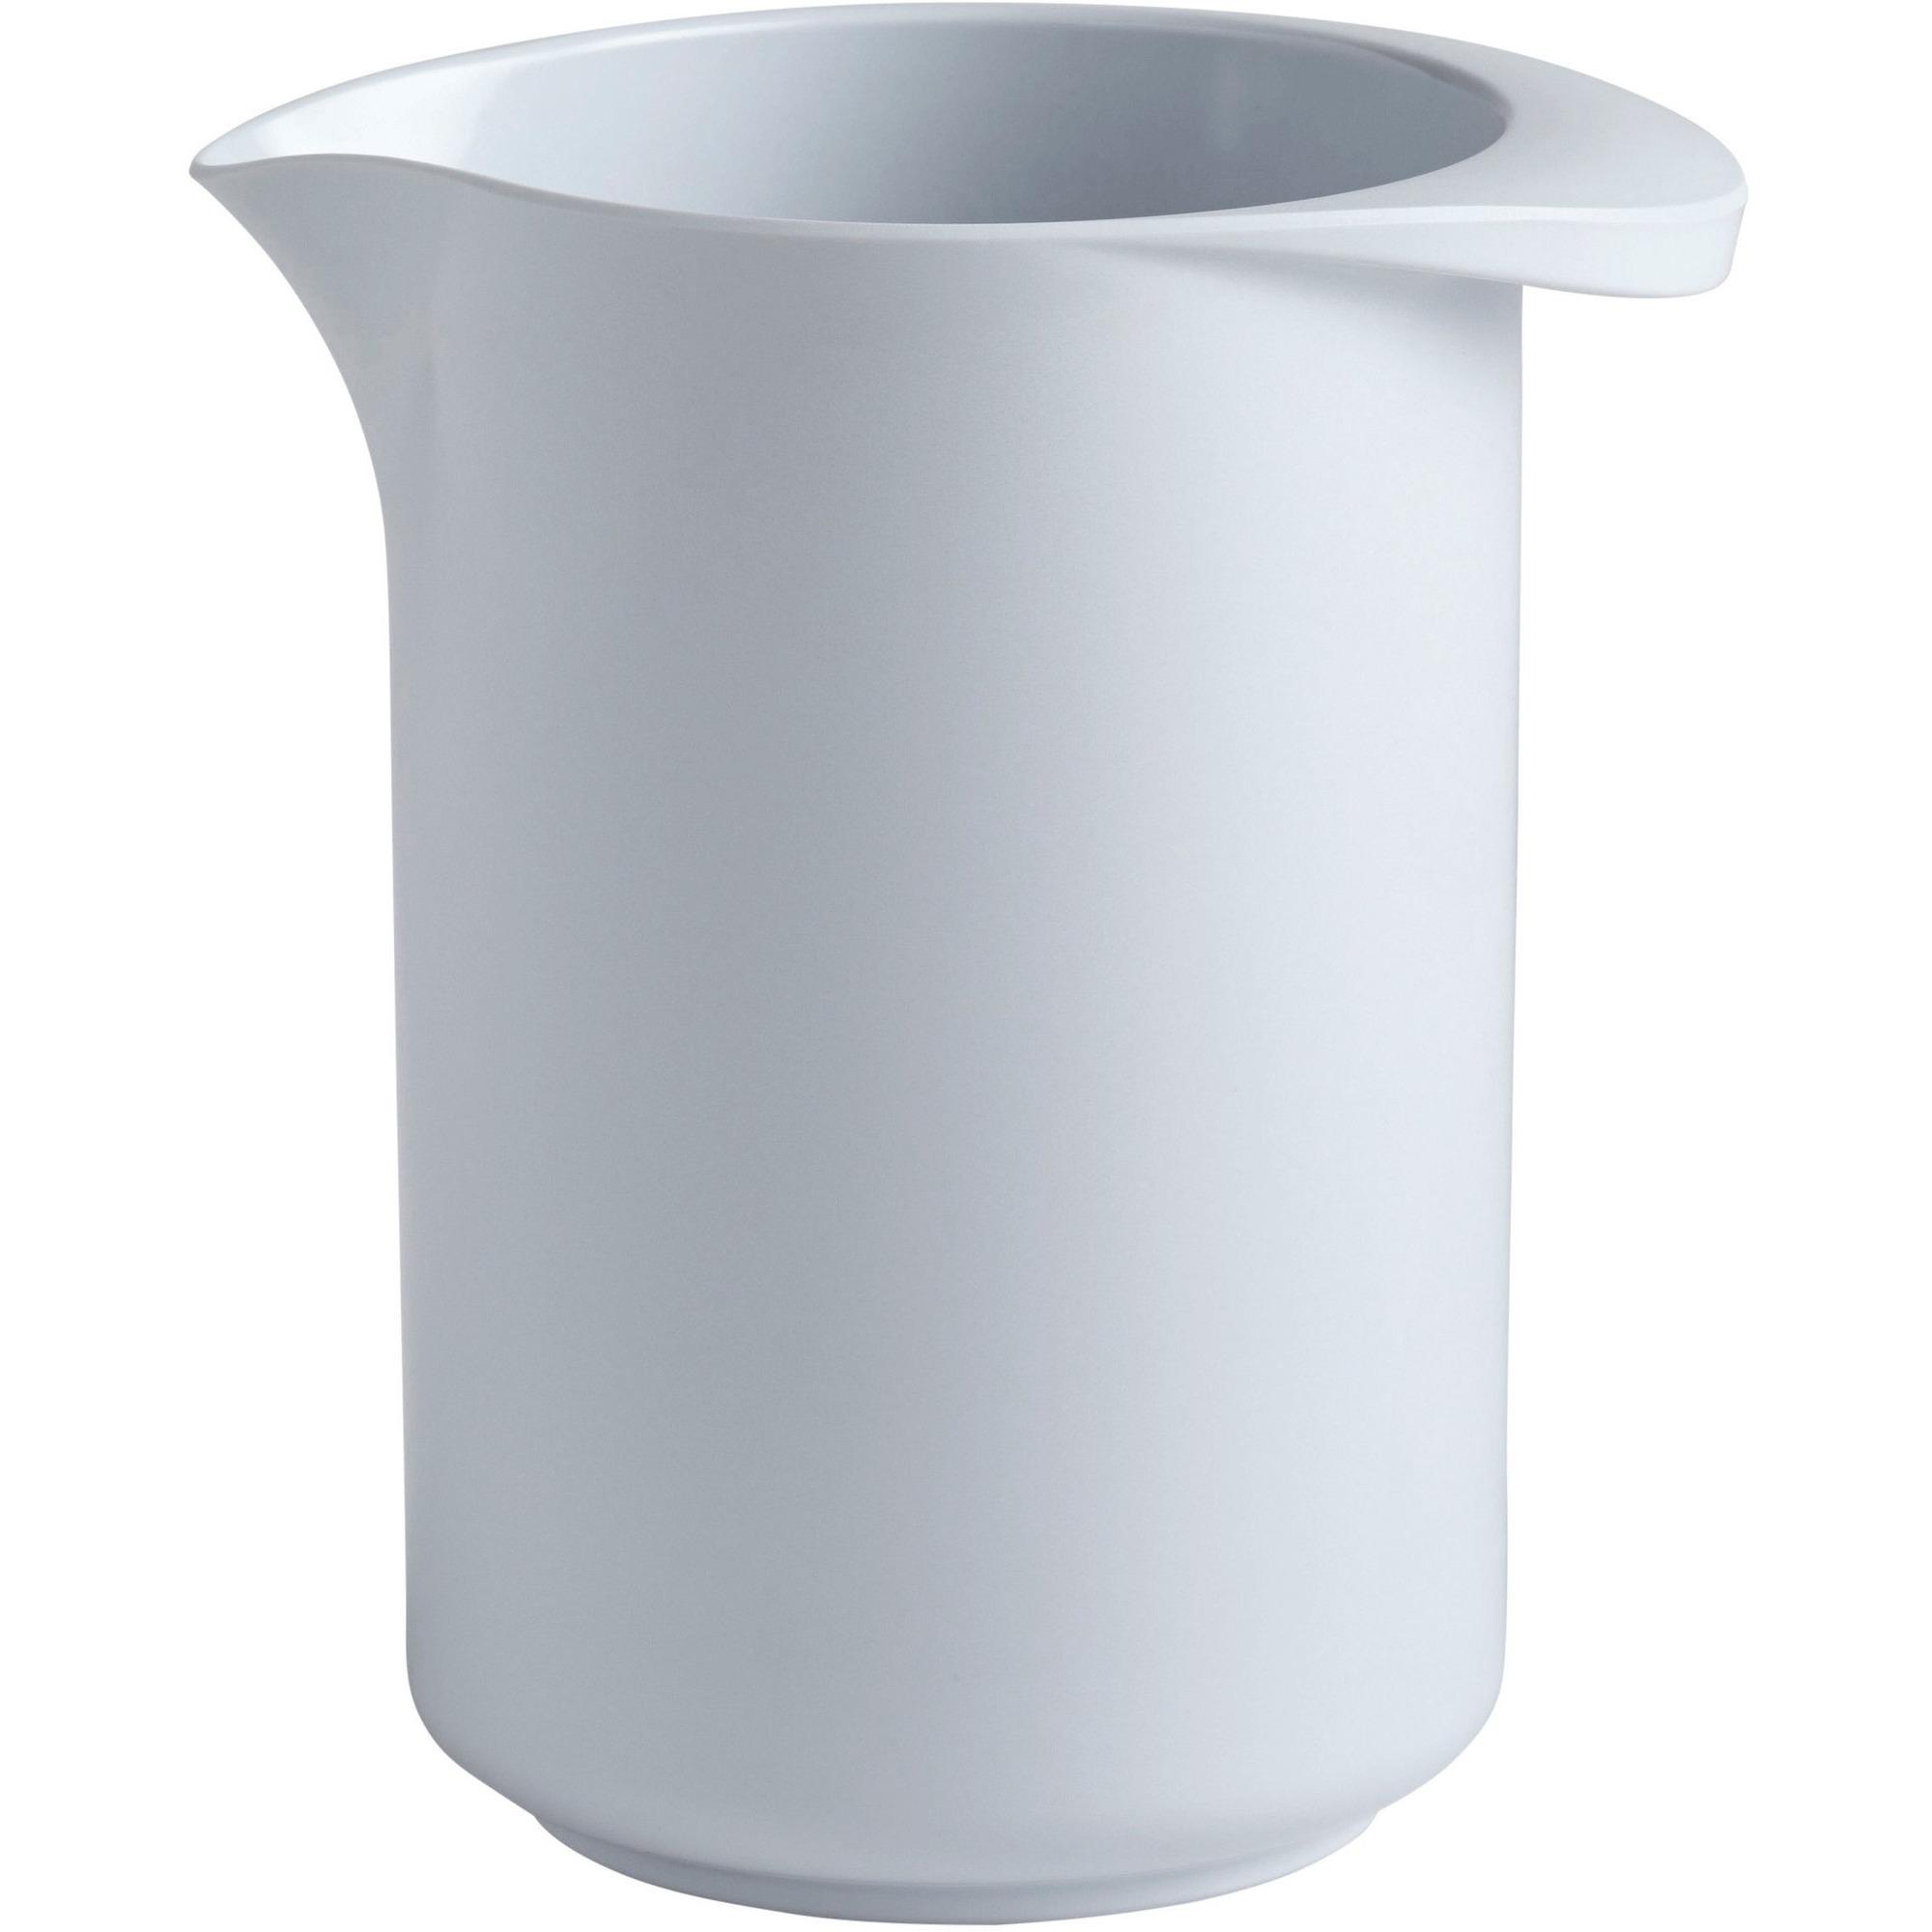 Rosti Mepal mixkanna 05 liter (Vit)